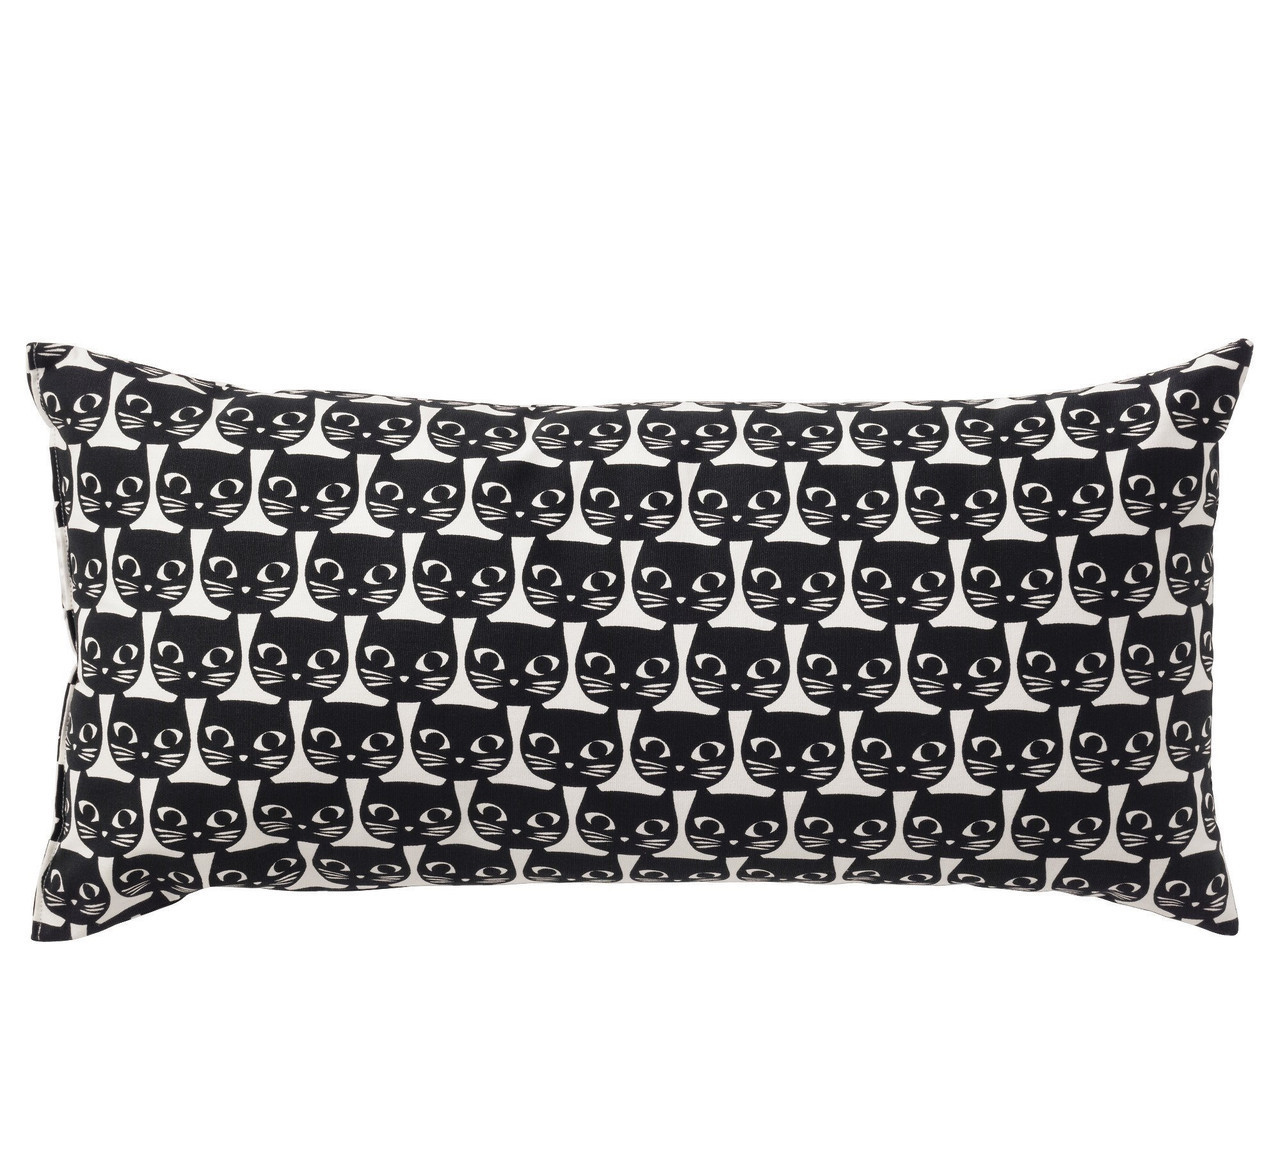 МАТТРАМ  Подушка, белый, черный, 50320023, ИКЕА, IKEA, MATTRAM